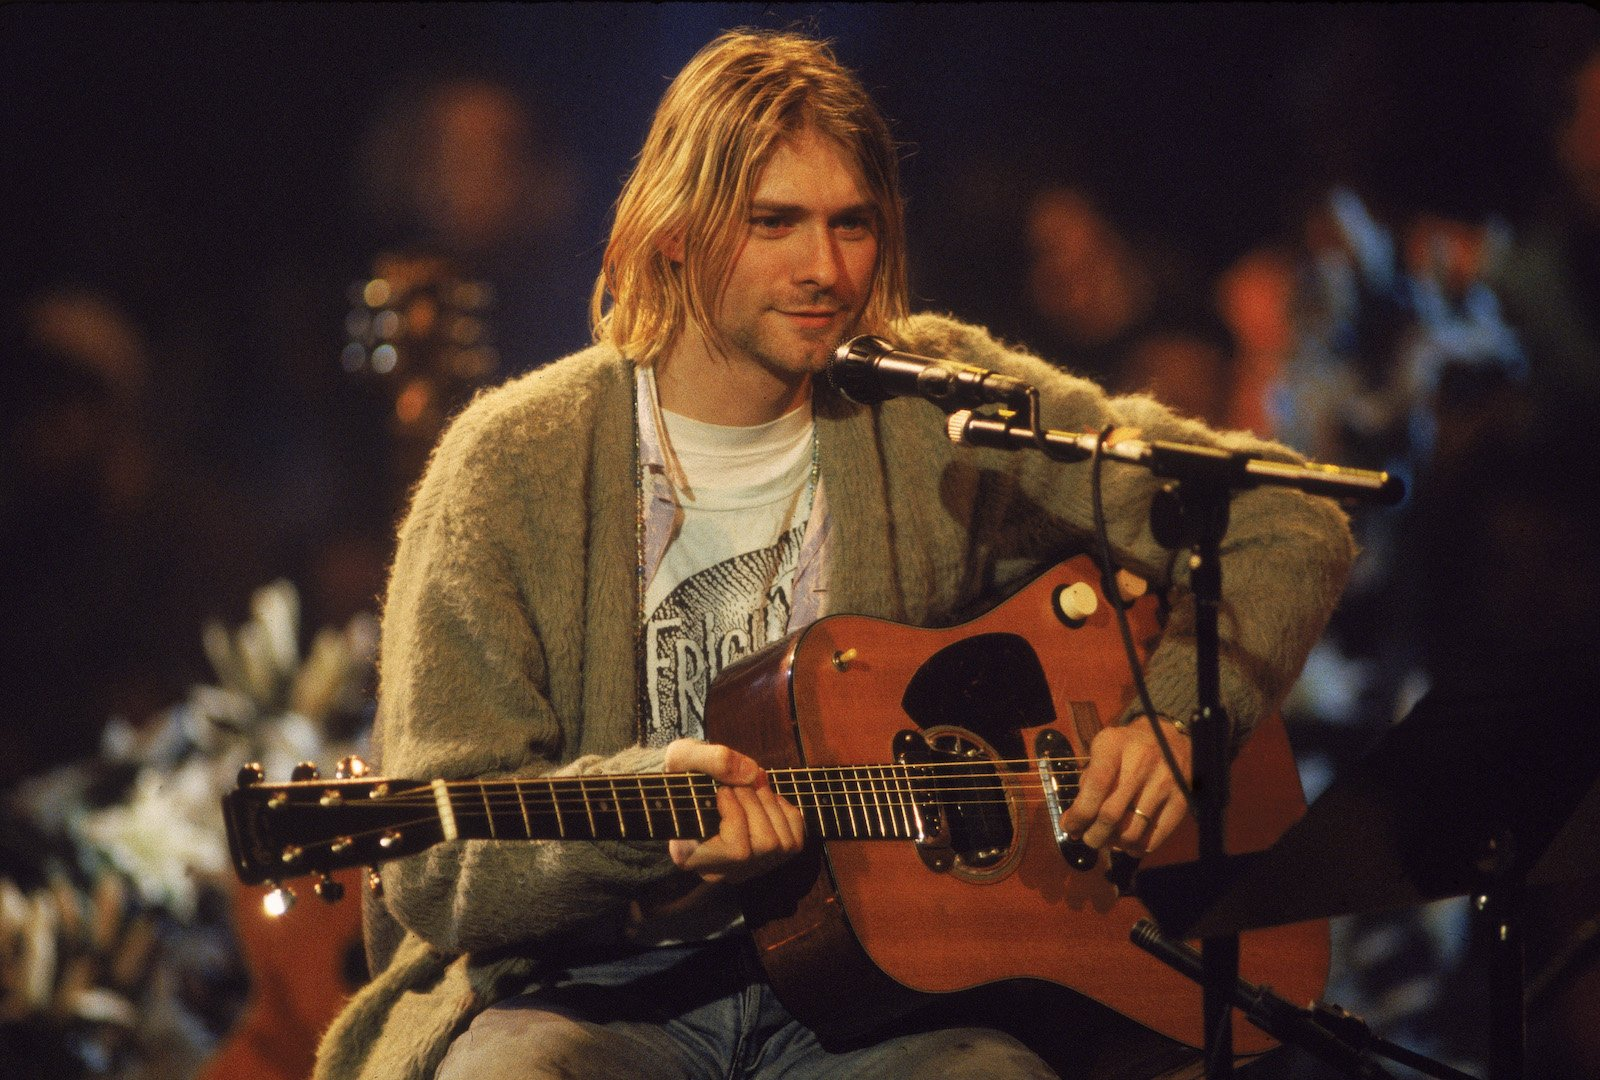 Iconic Kurt Cobain guitar goes to Frances Bean's ex after 2-year legal battle https://t.co/sCHv8GqNUa https://t.co/O6wCXMJxUf